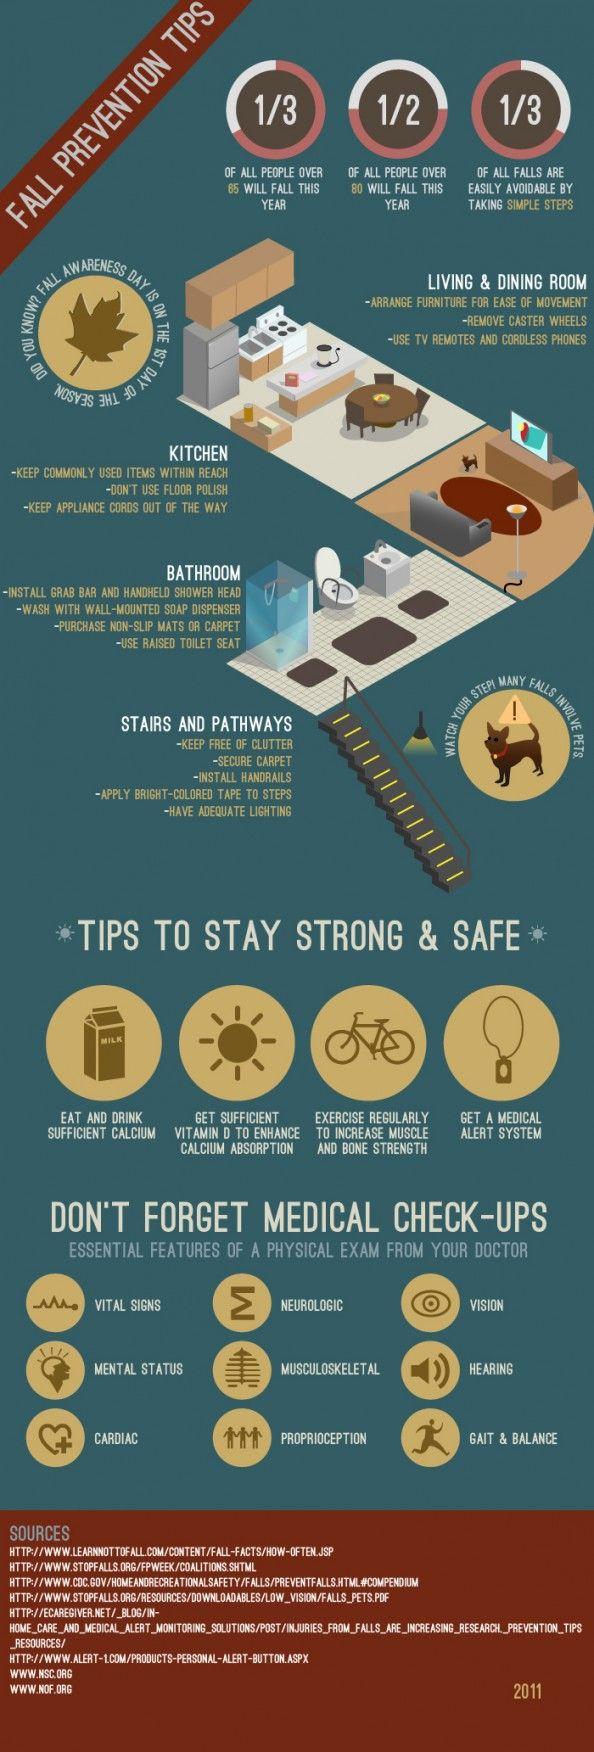 139 best Kitchen Safety images on Pinterest | Funny stuff, Brussels ...